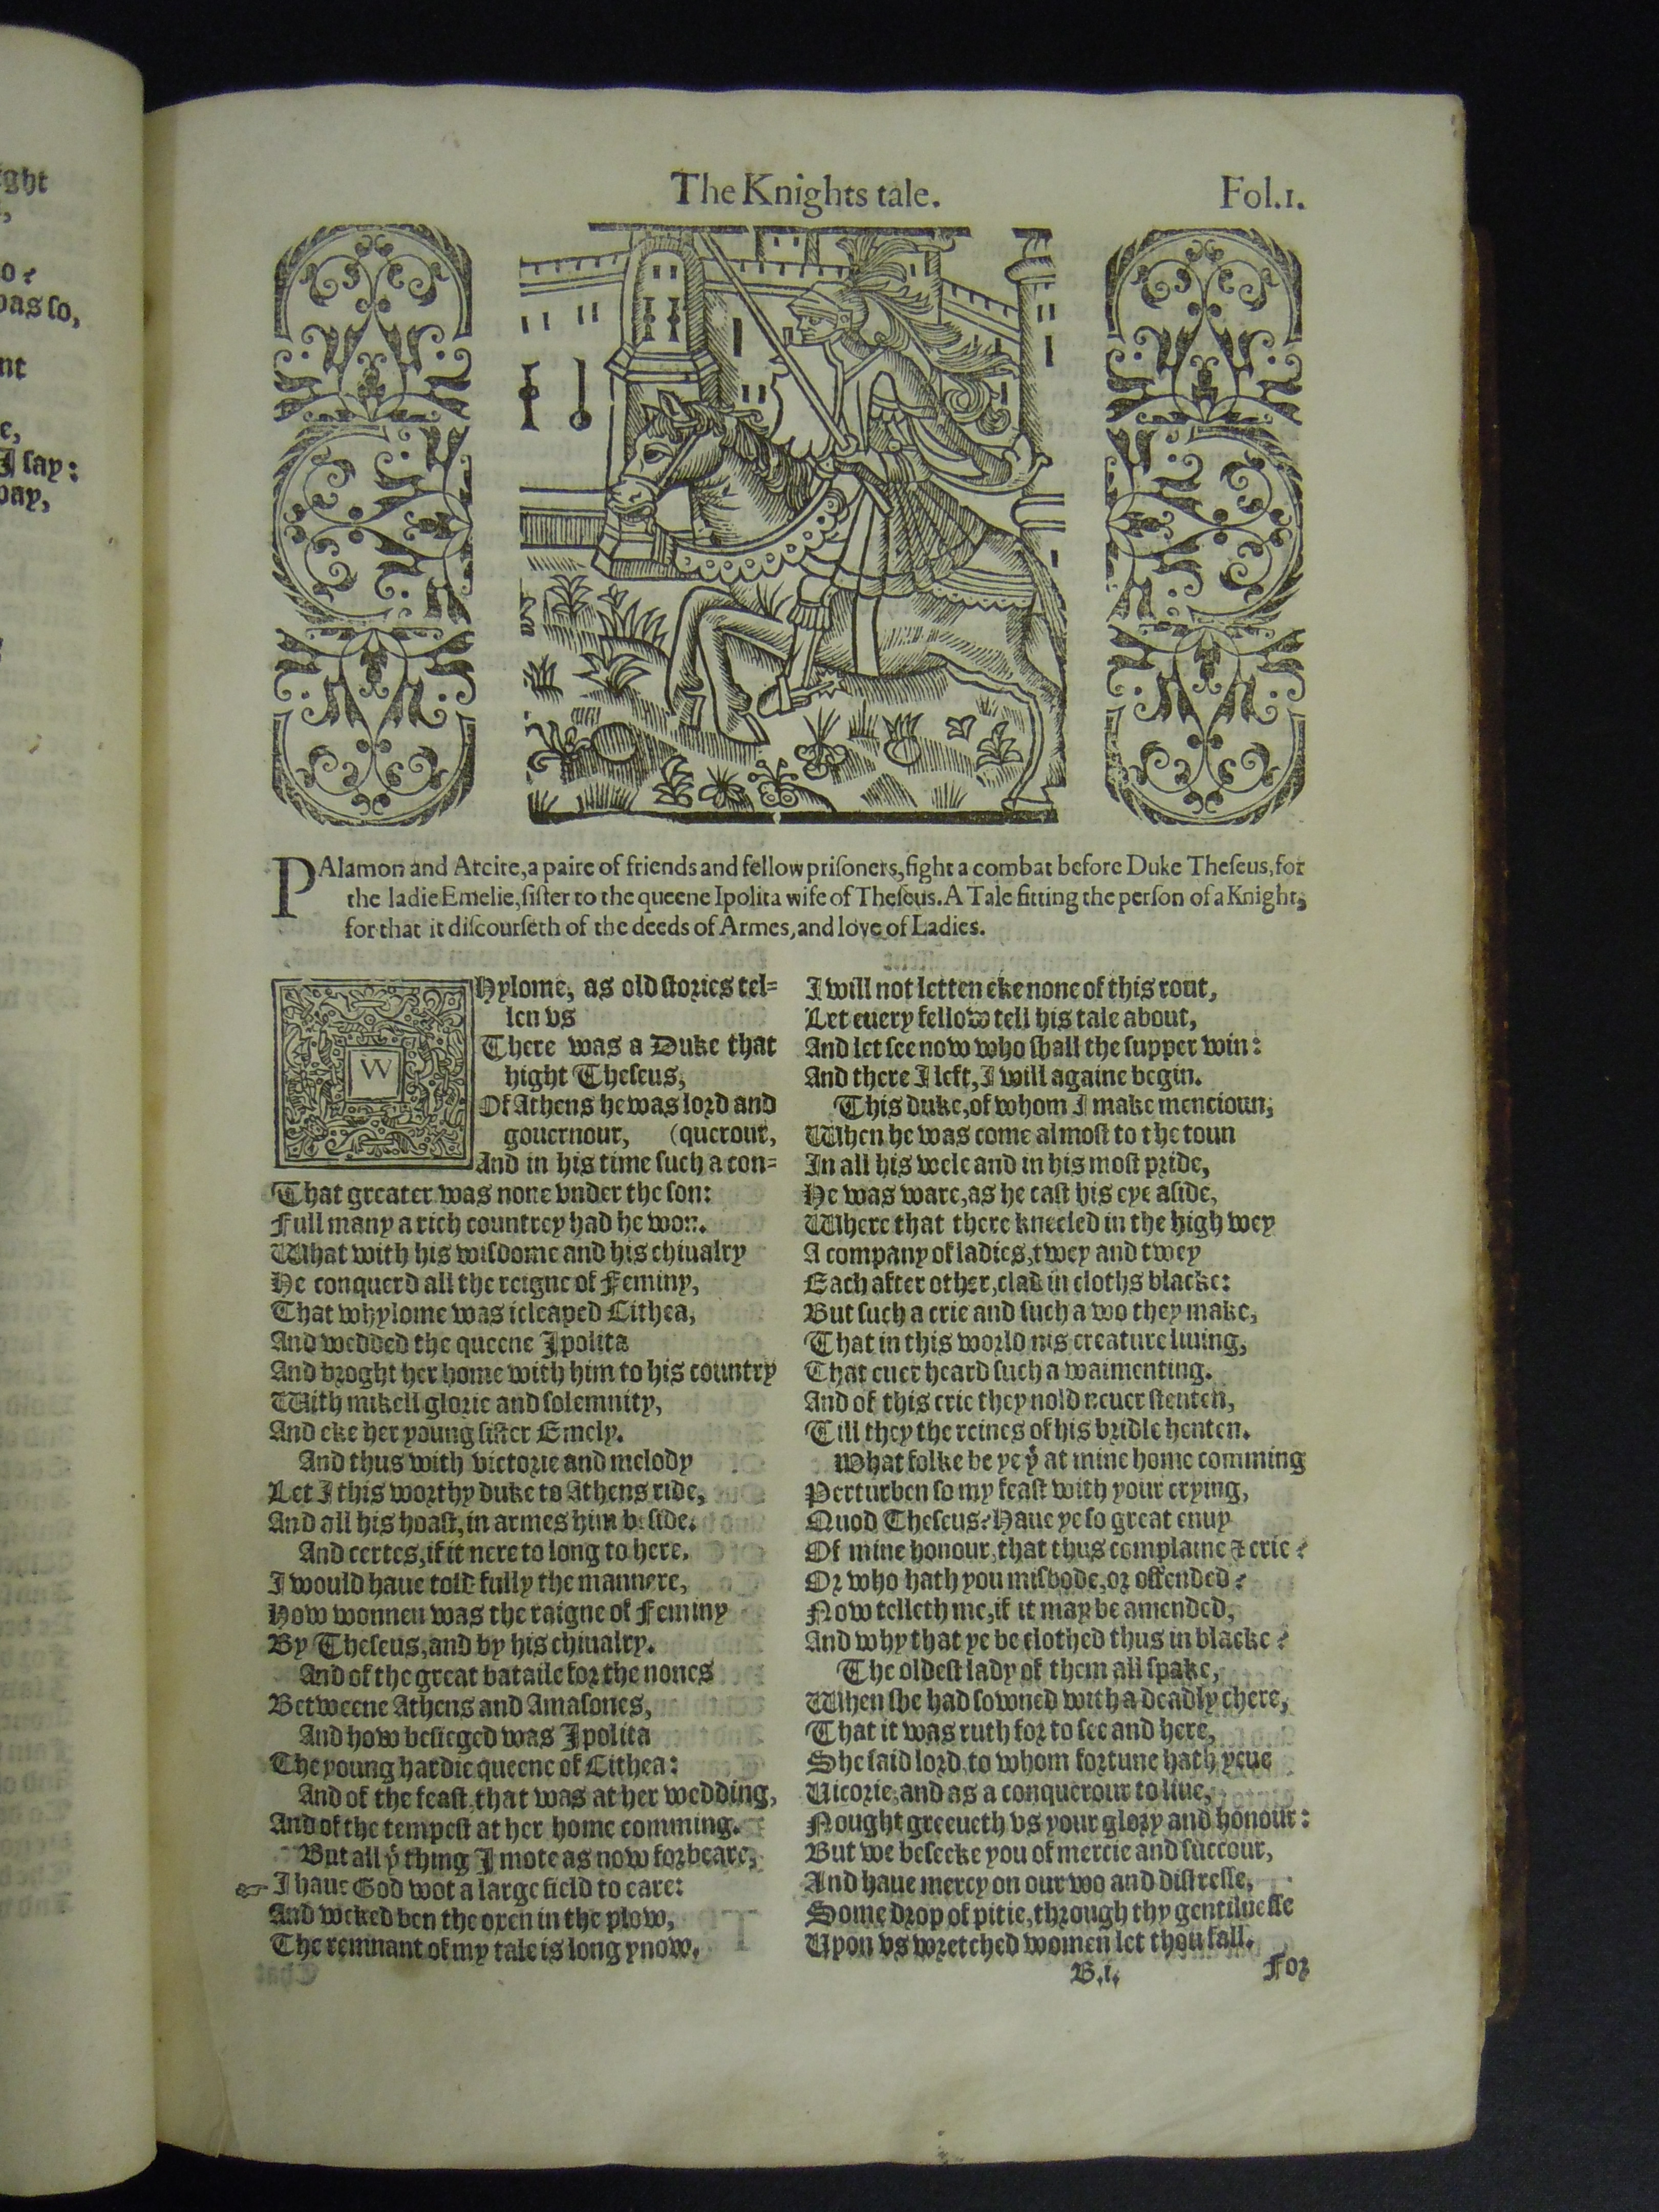 BT1.19.2, fol. 1 (Bi), Geoffrey Chaucer's Works, 1602